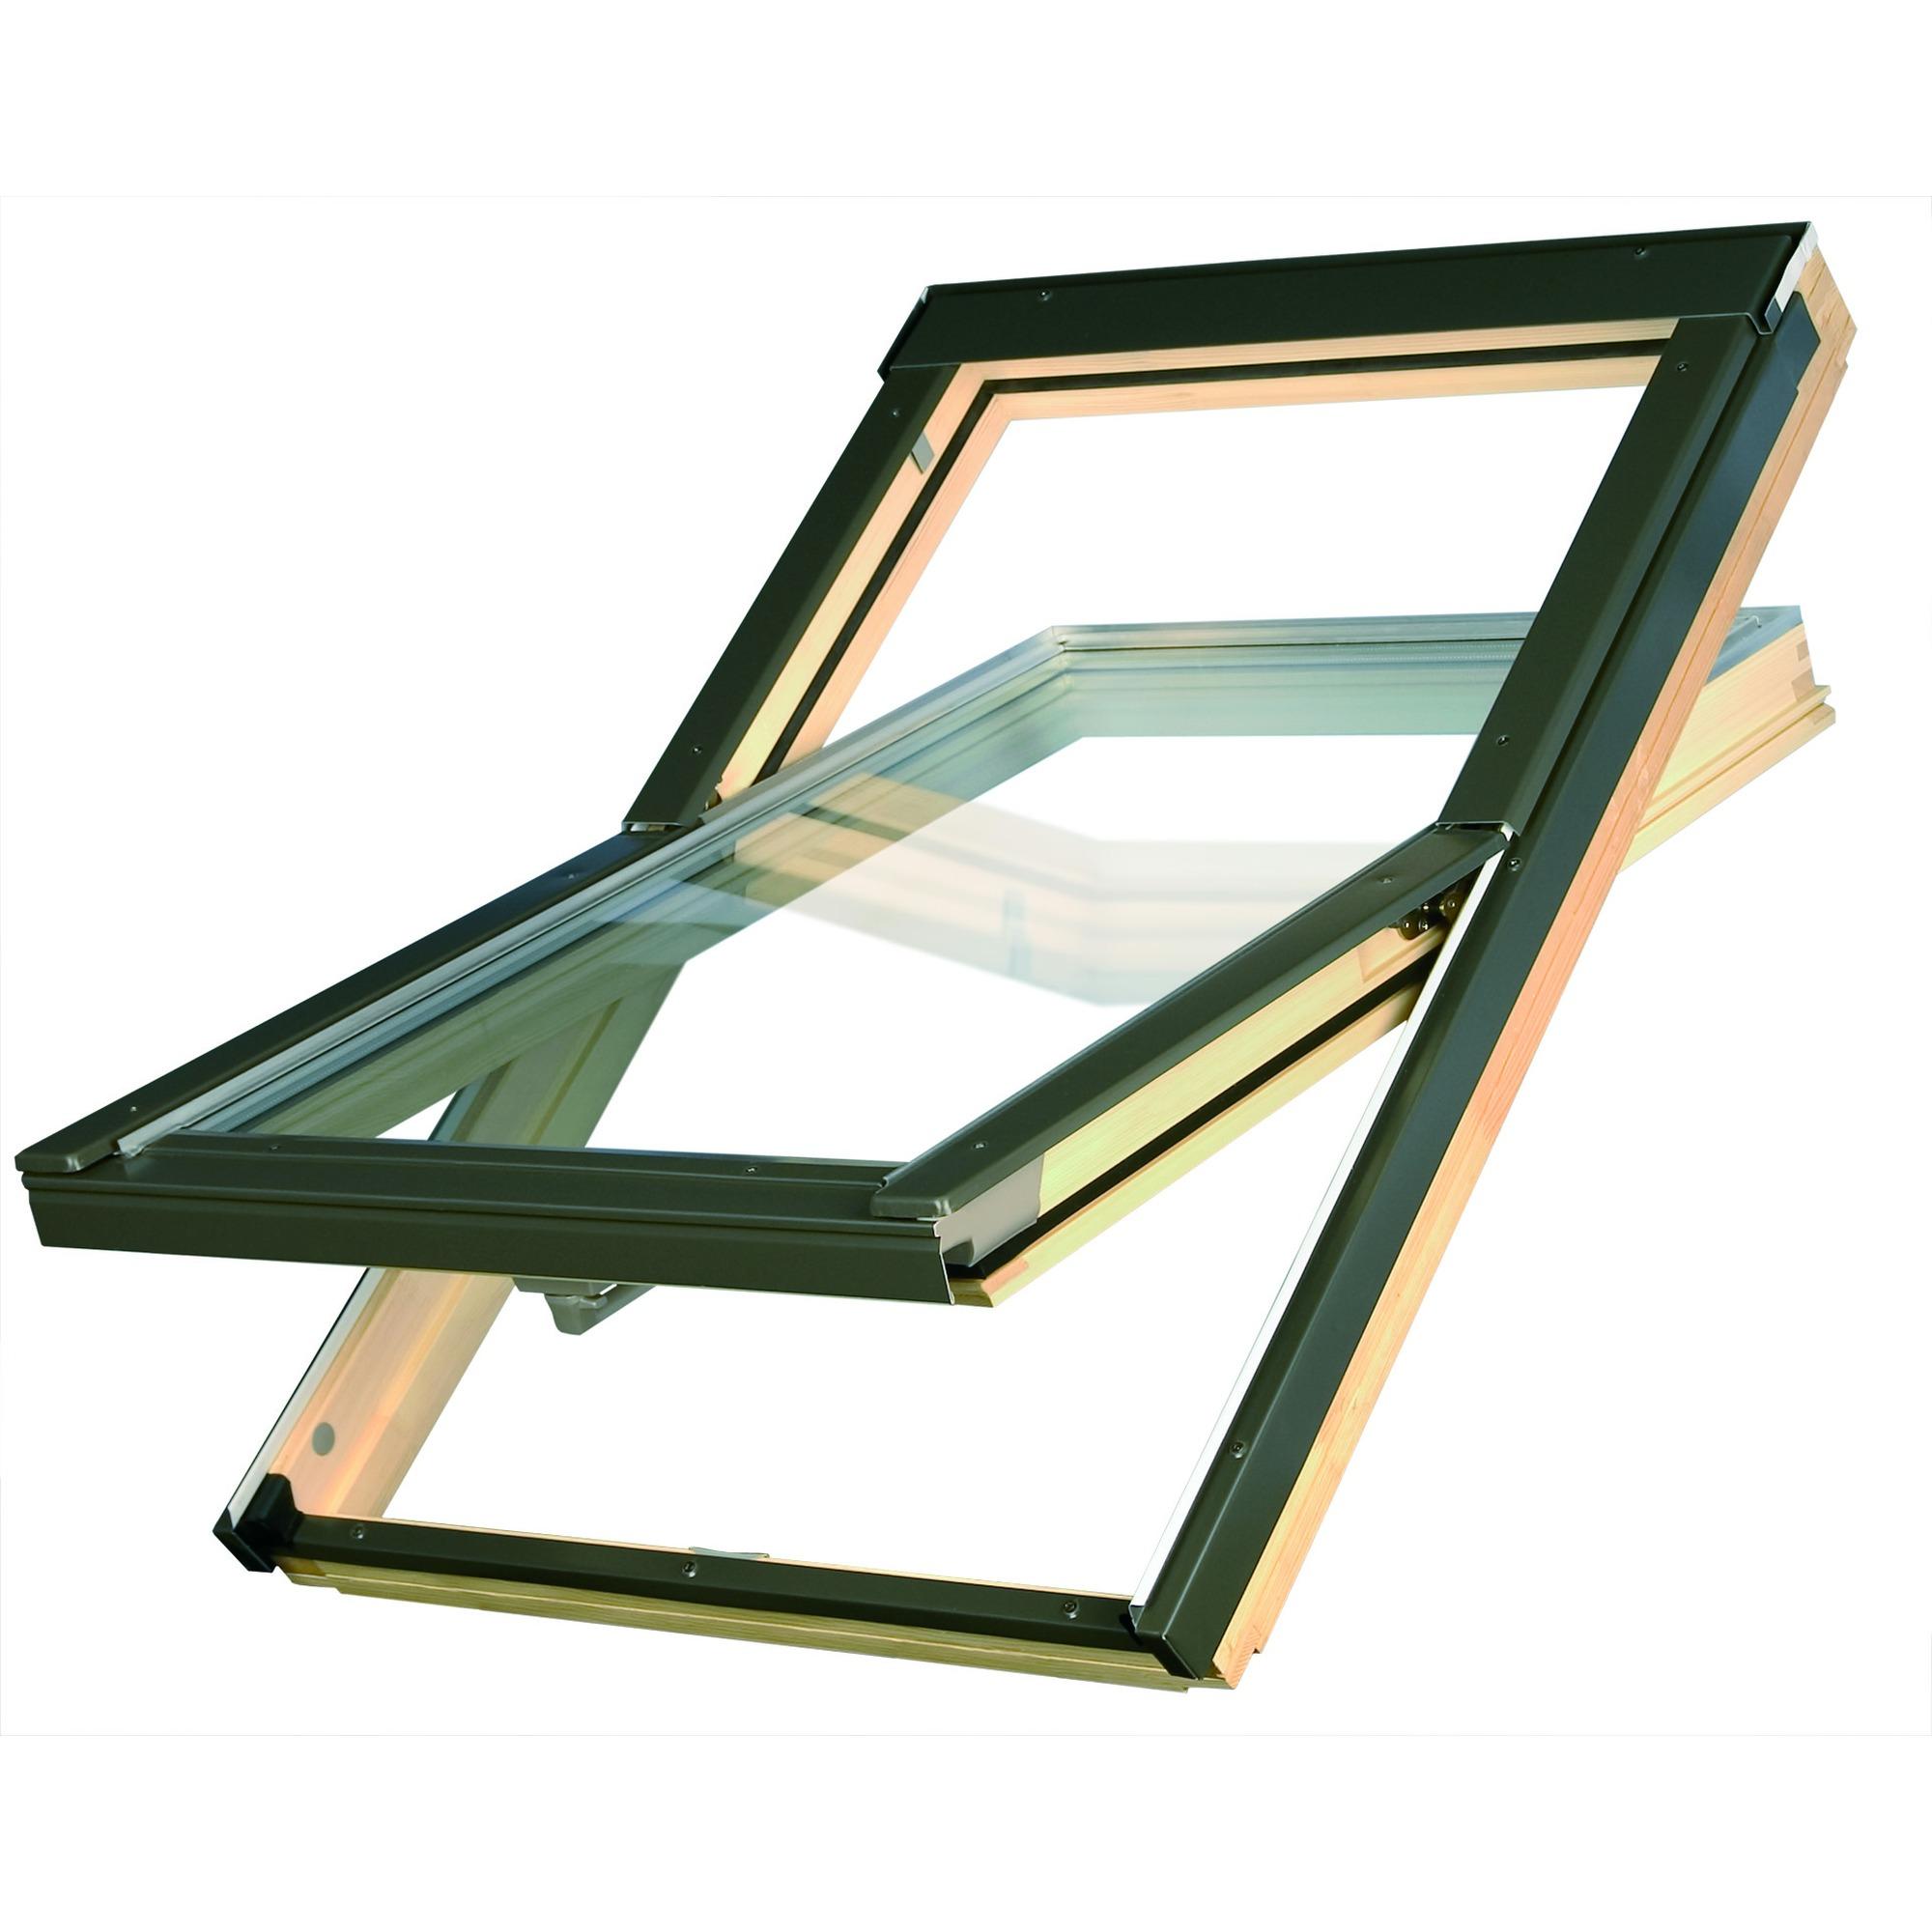 optilight dakvenster 78x98 cm dakramen dakramen bouwmaterialen. Black Bedroom Furniture Sets. Home Design Ideas